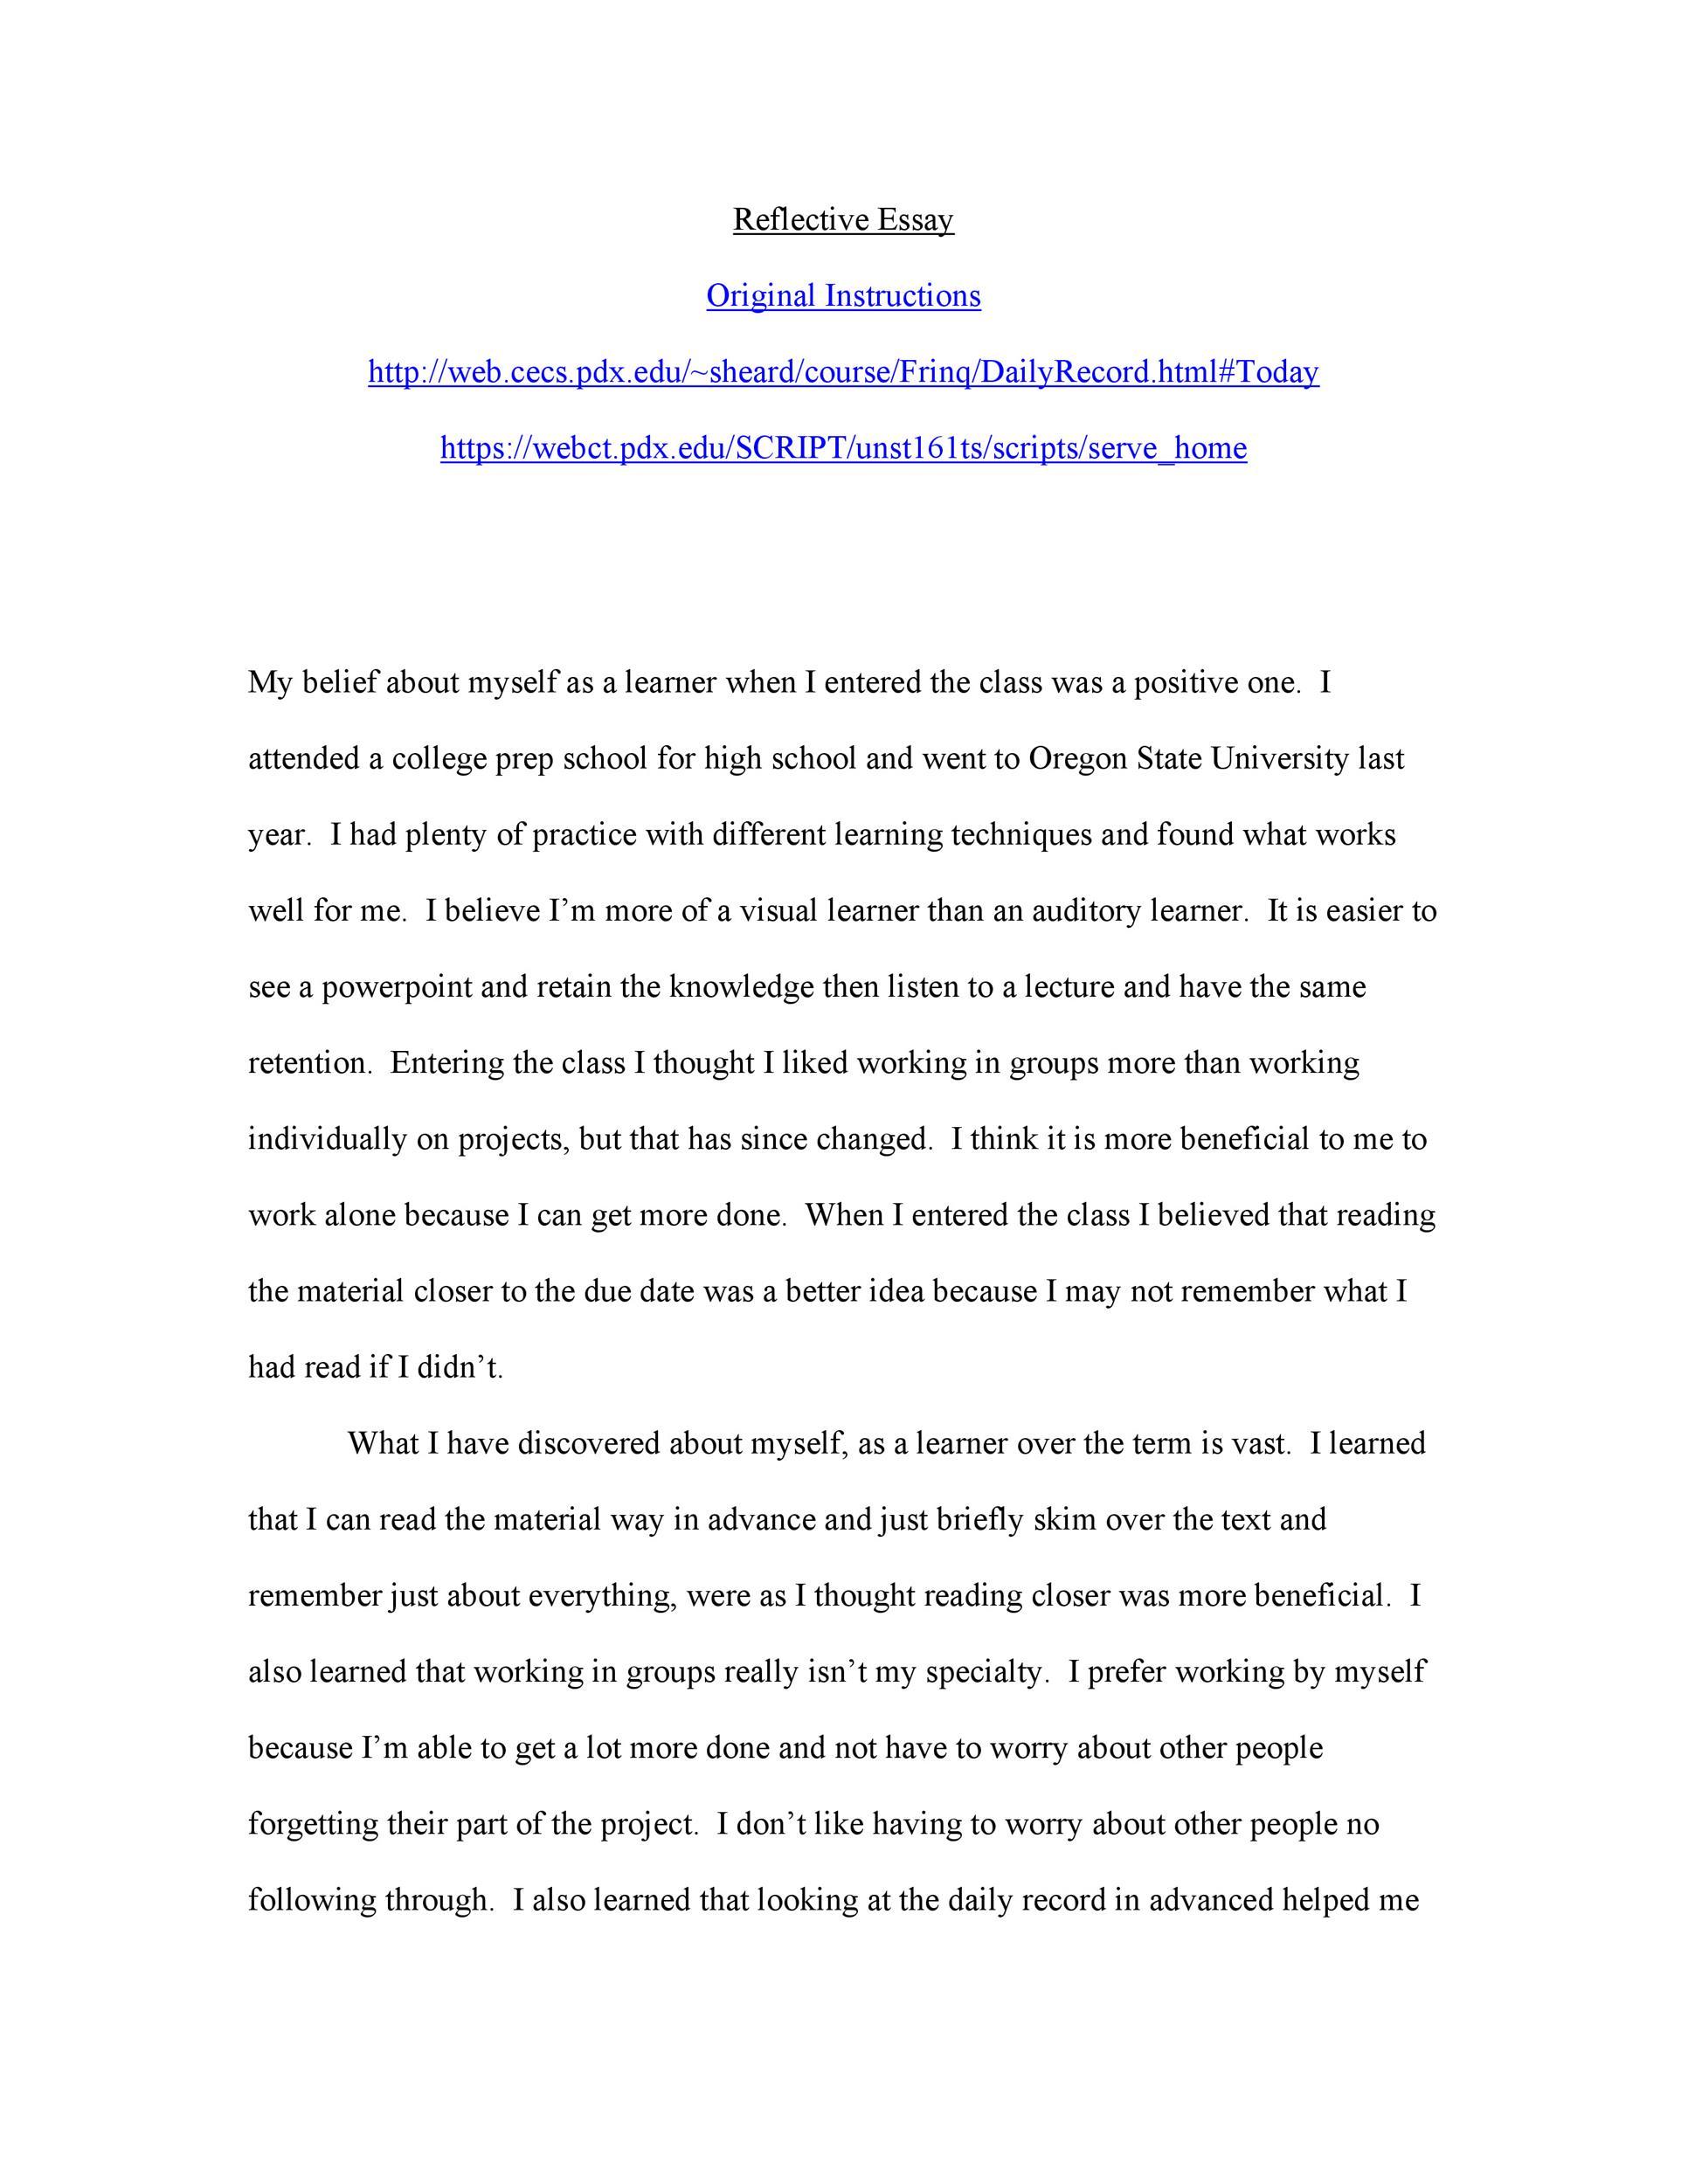 Free reflective essay example 02